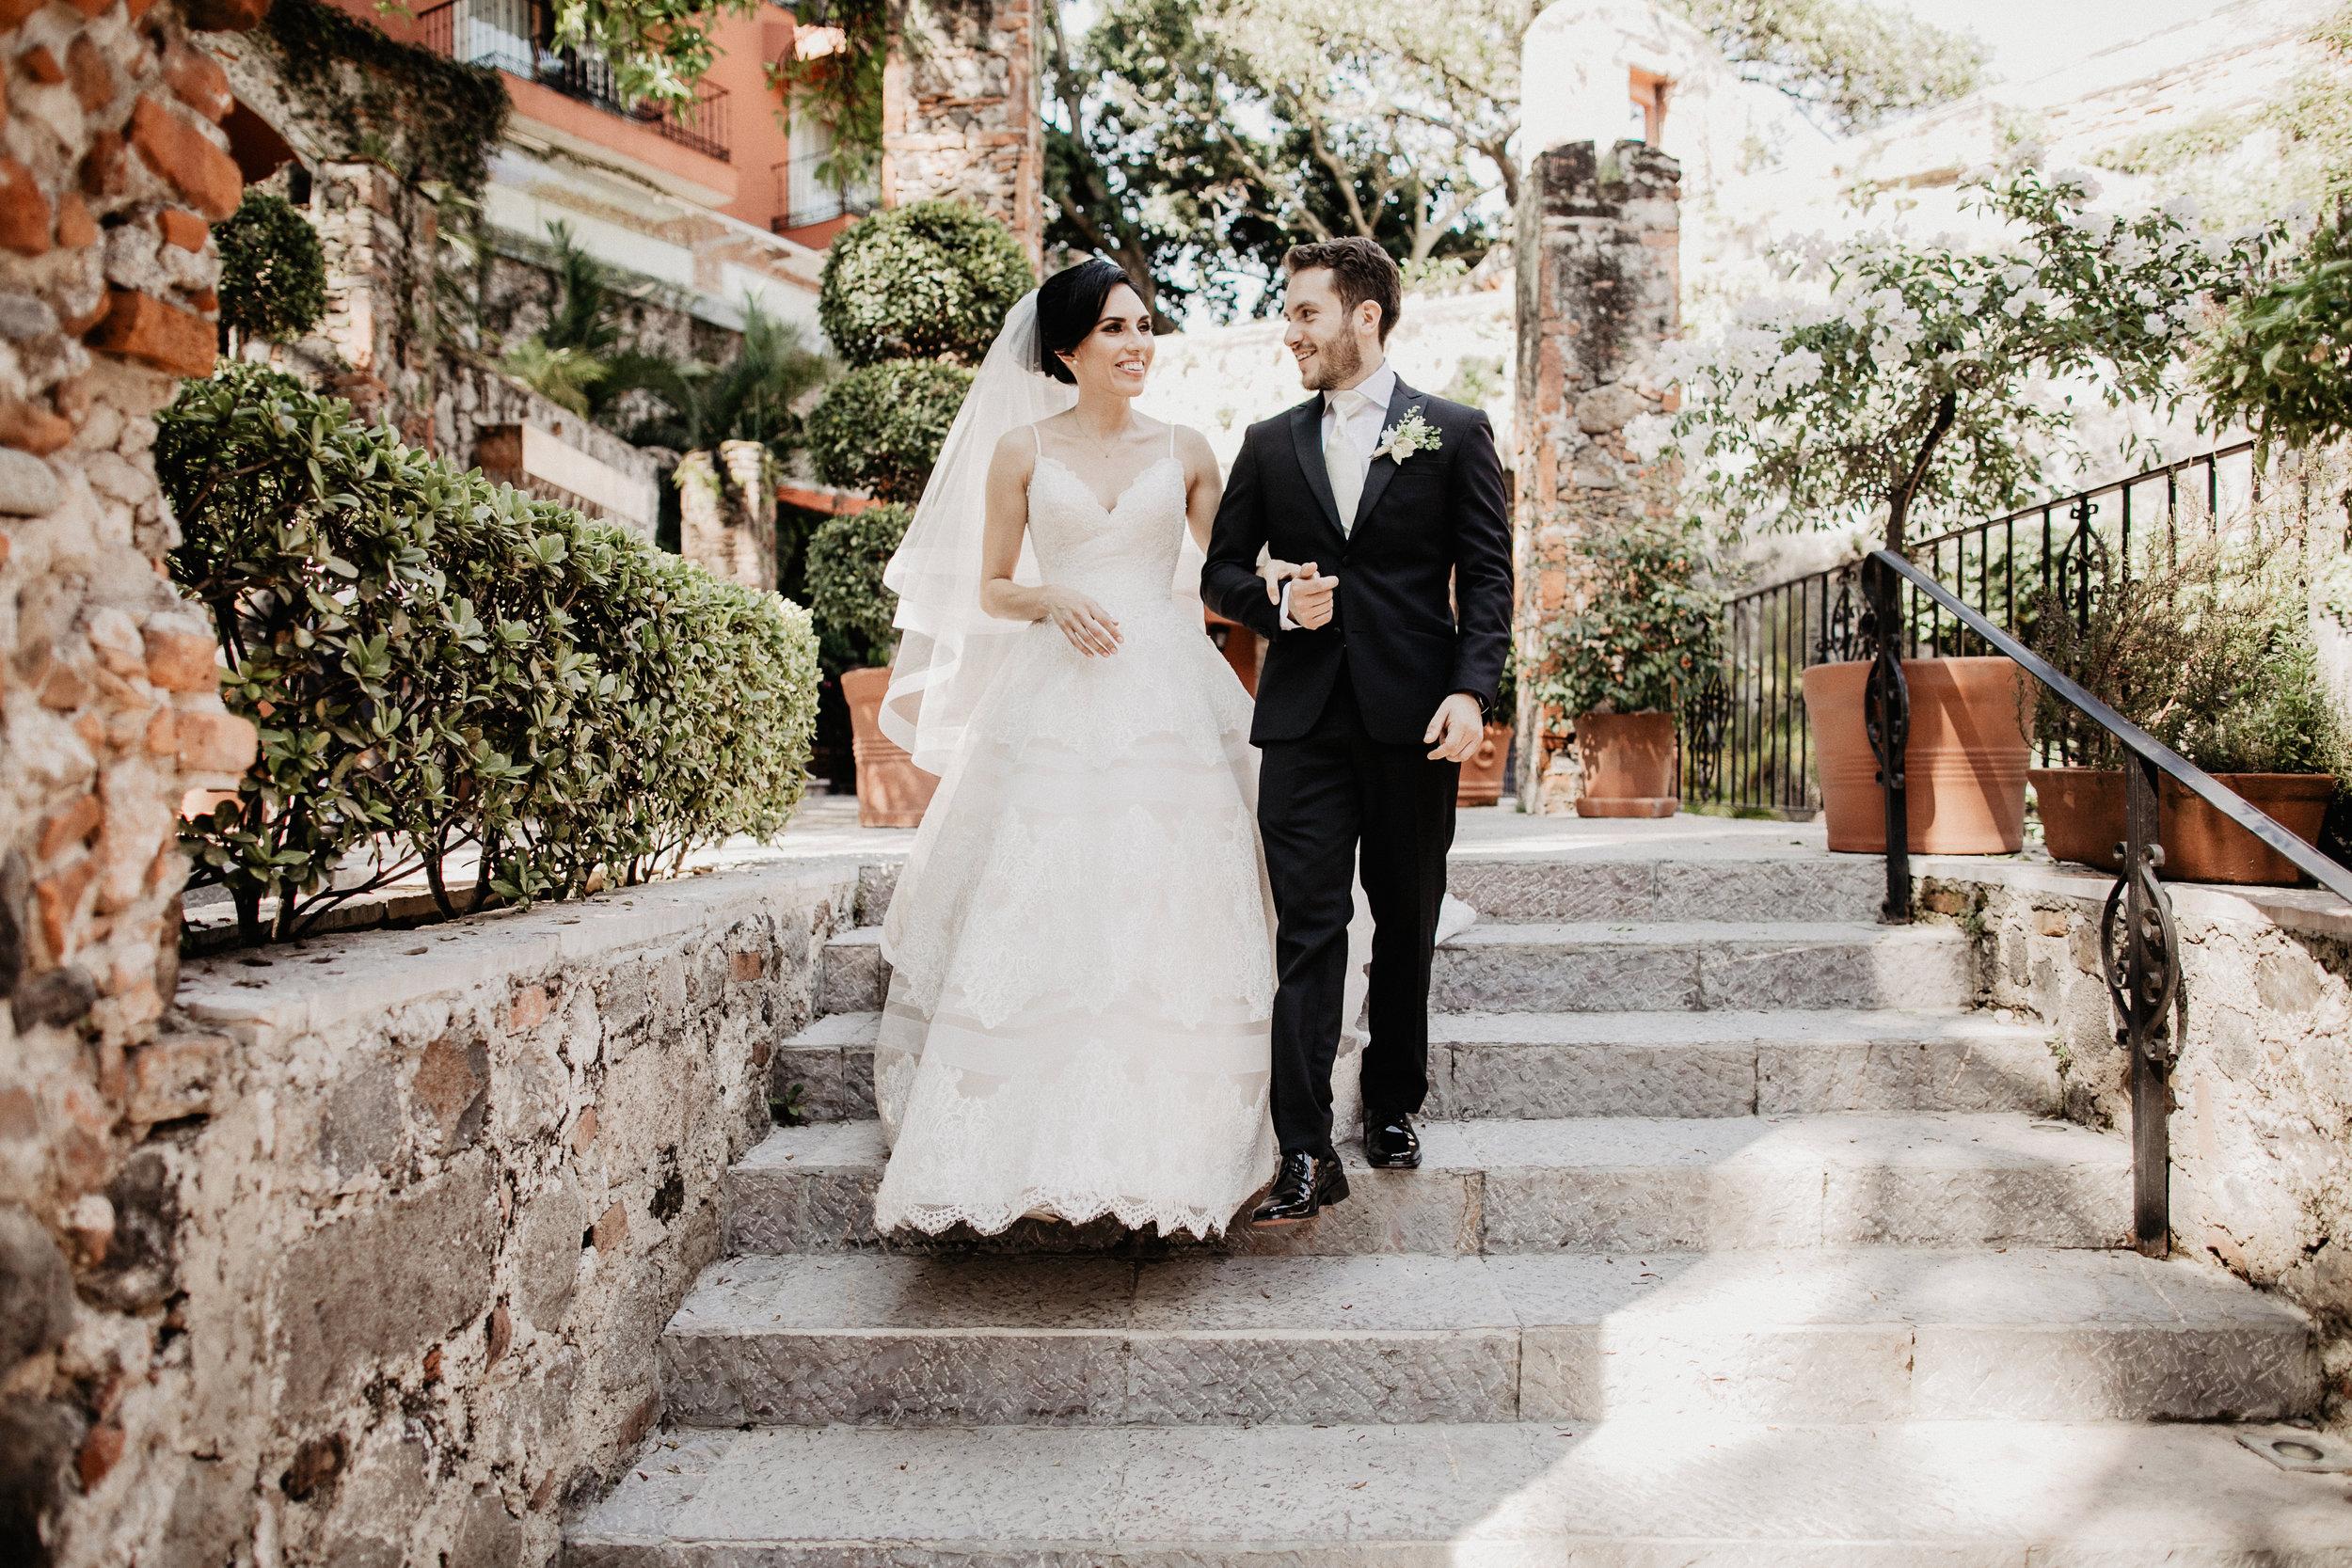 Alfonso_flores_destination_wedding_photography_vanesa_carlos-305.JPG